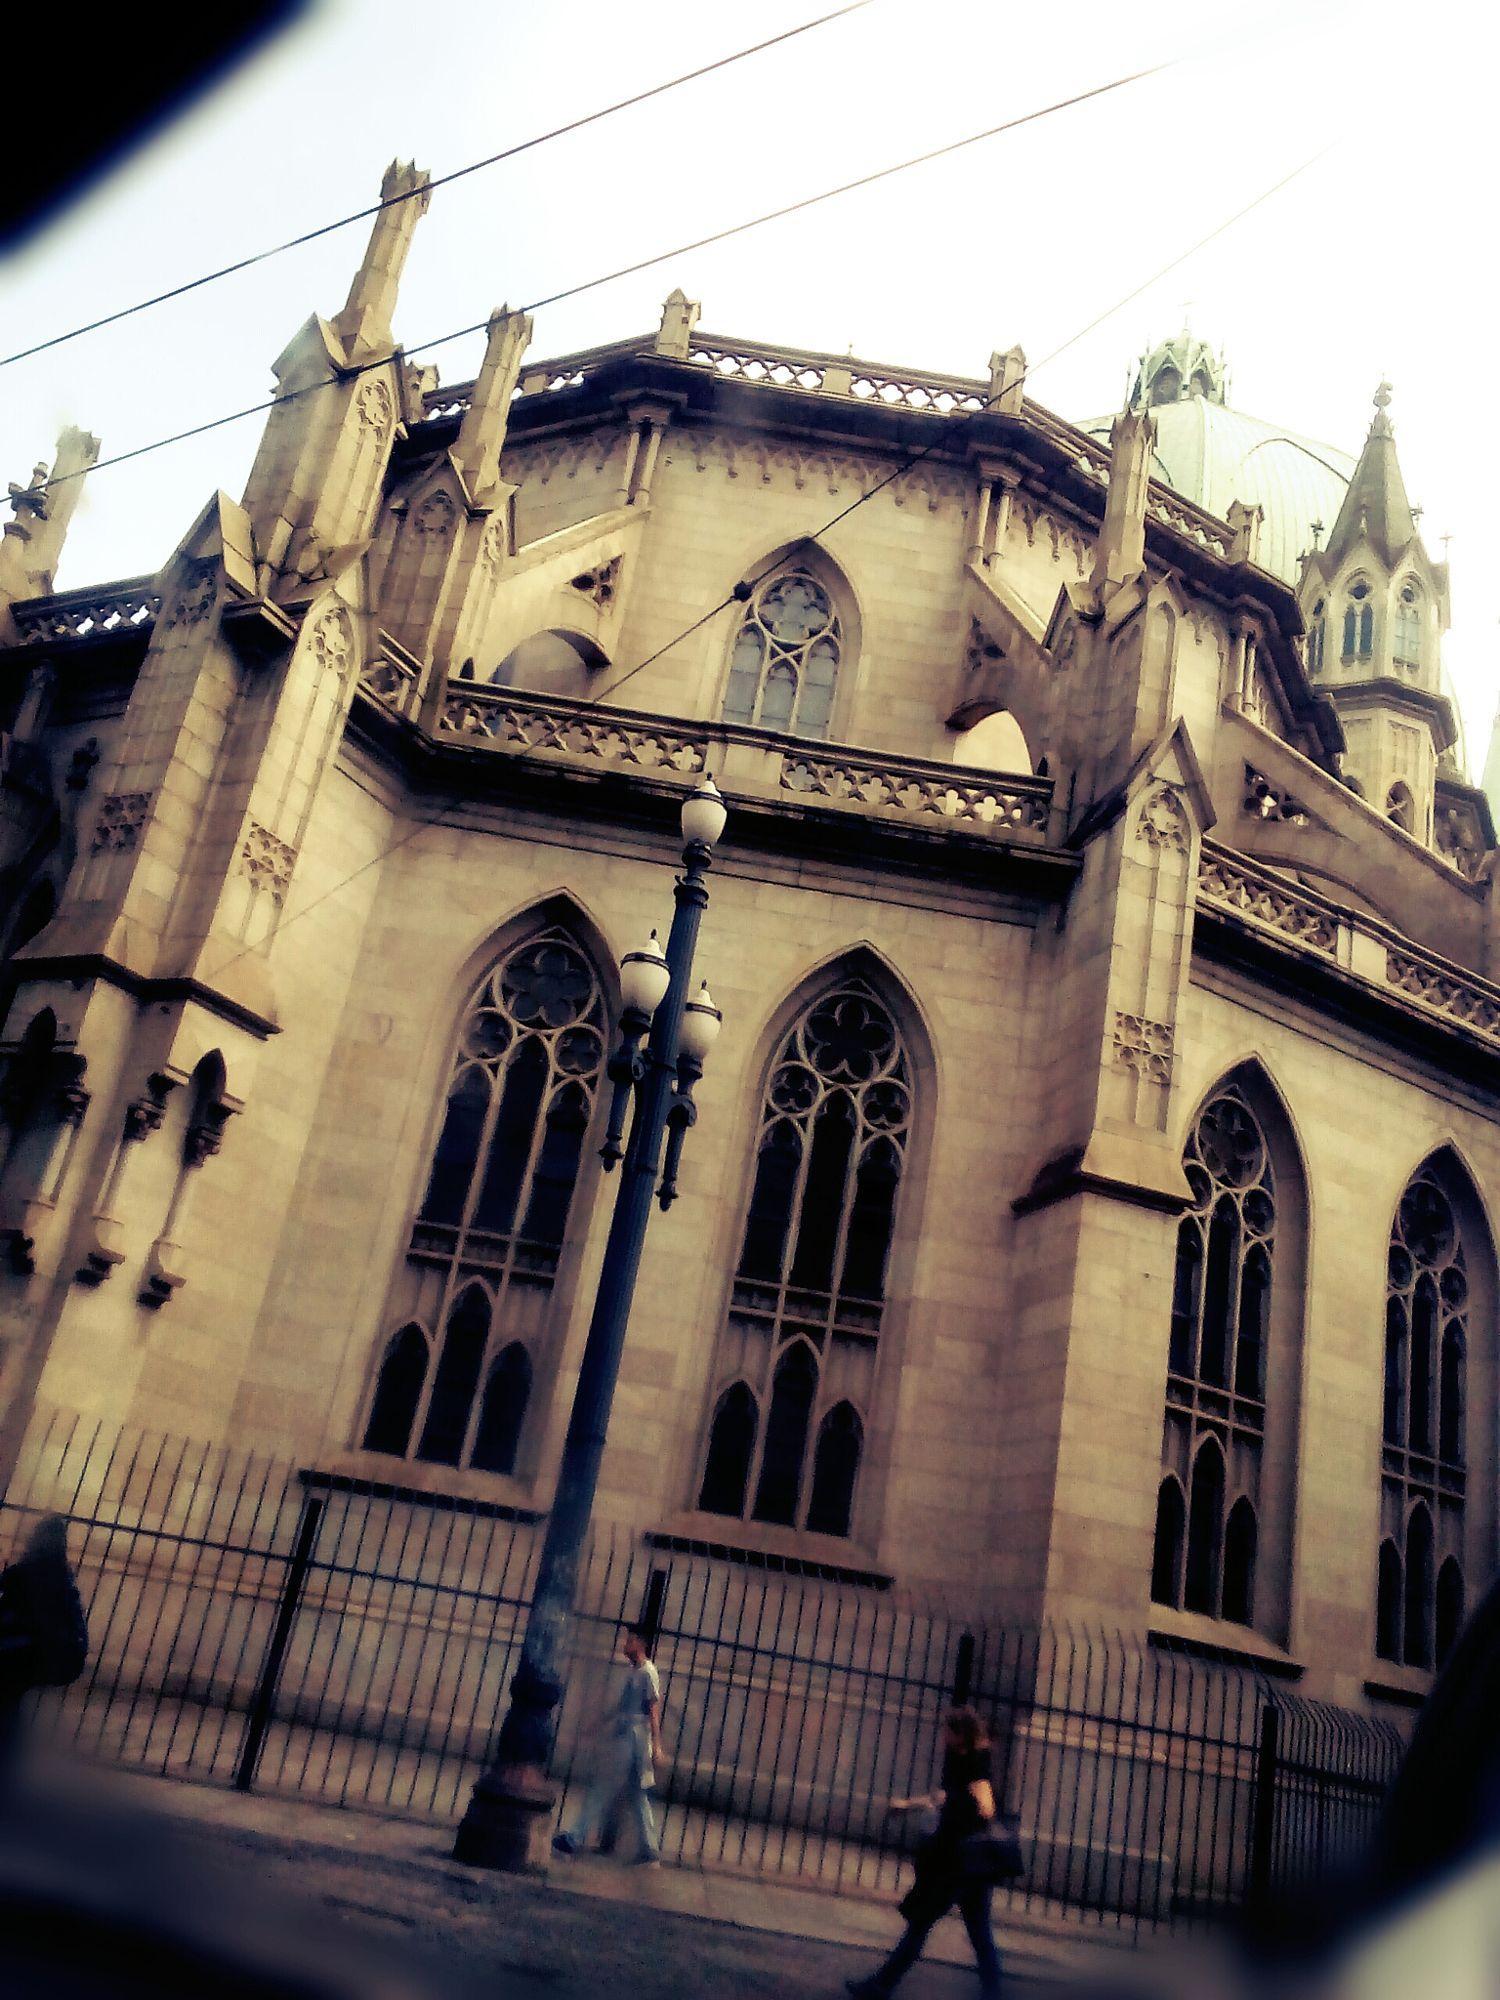 Sao Paulo City  City and architecture photo by ElieserBotelhodaSilva http://rarme.com/?F9gZi